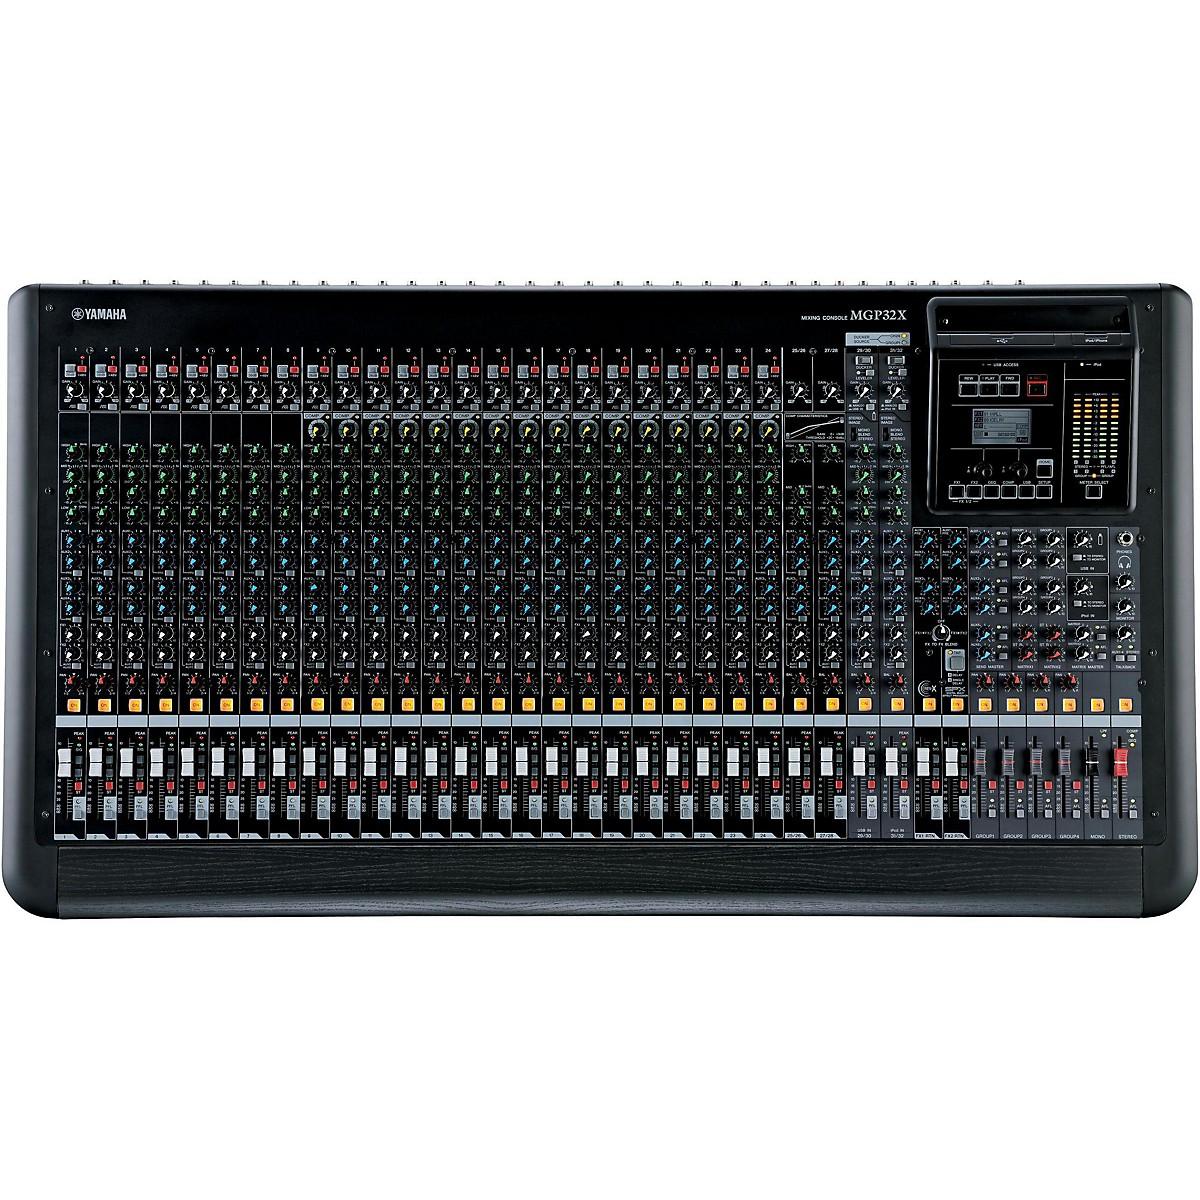 Yamaha MGP32X 32-Input Hybrid Digital/Analog Mixer with USB Rec/Play and Effects